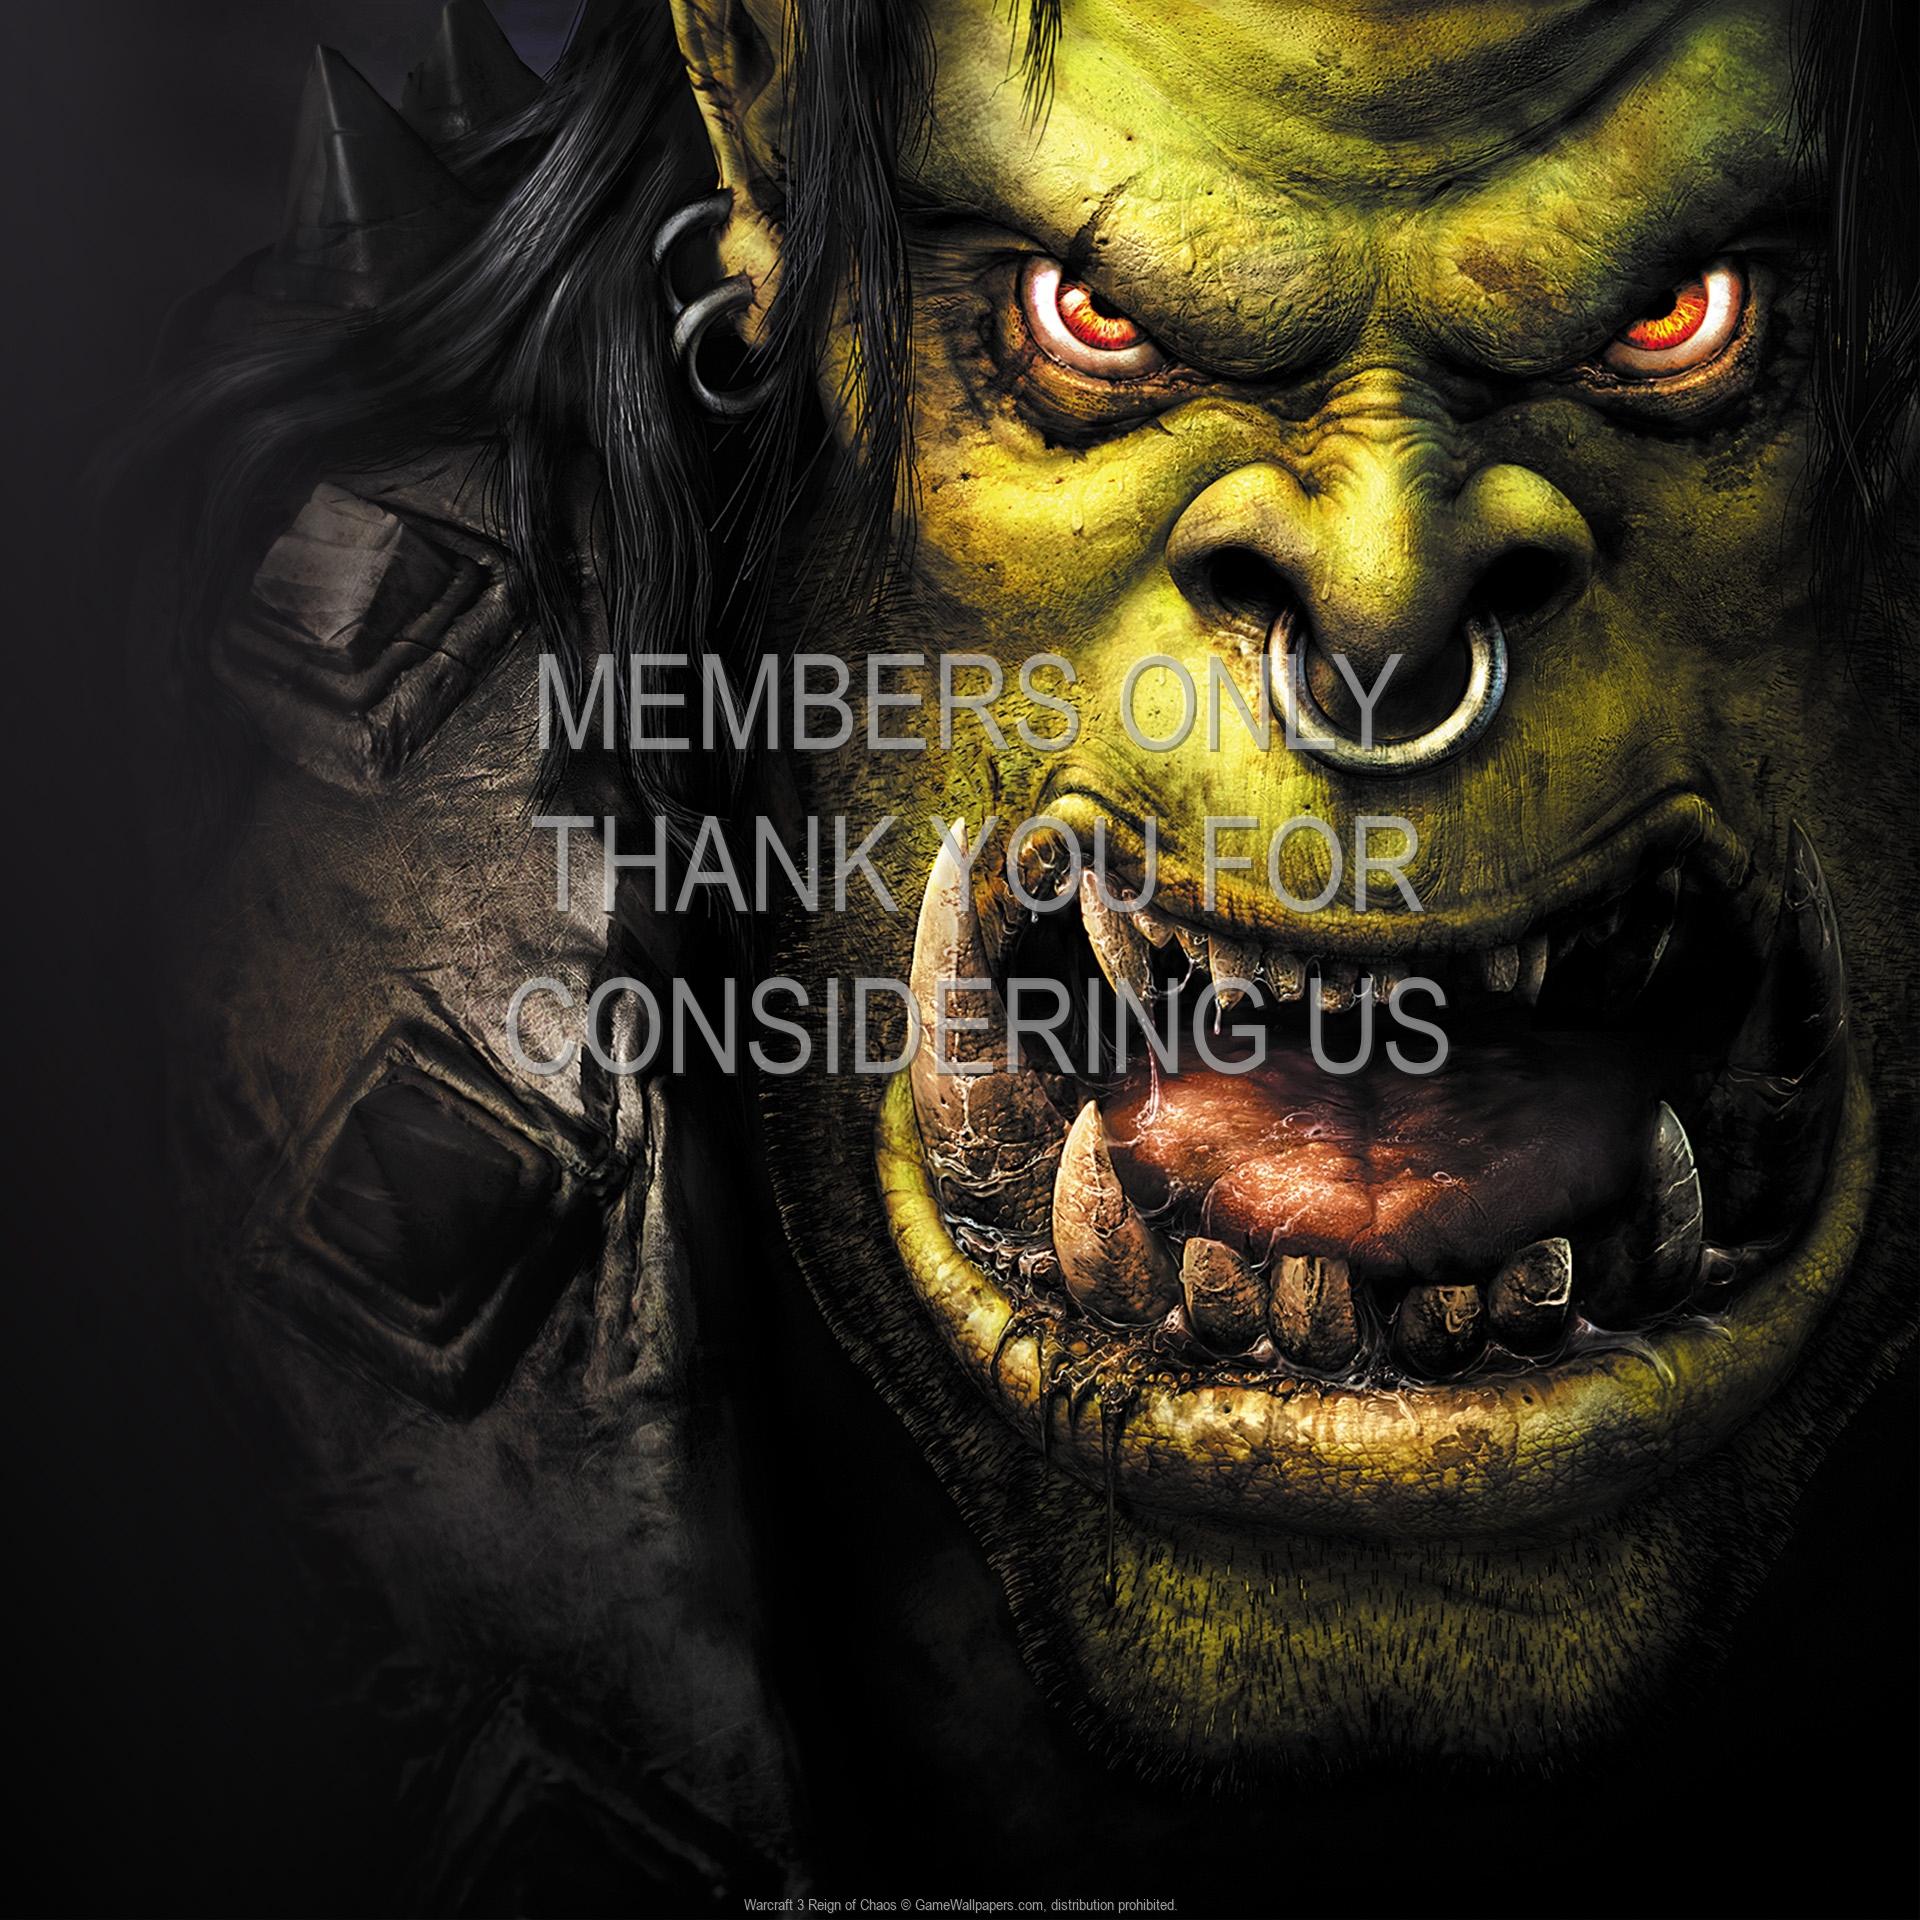 Warcraft 3: Reign of Chaos 1920x1080 Handy Hintergrundbild 21